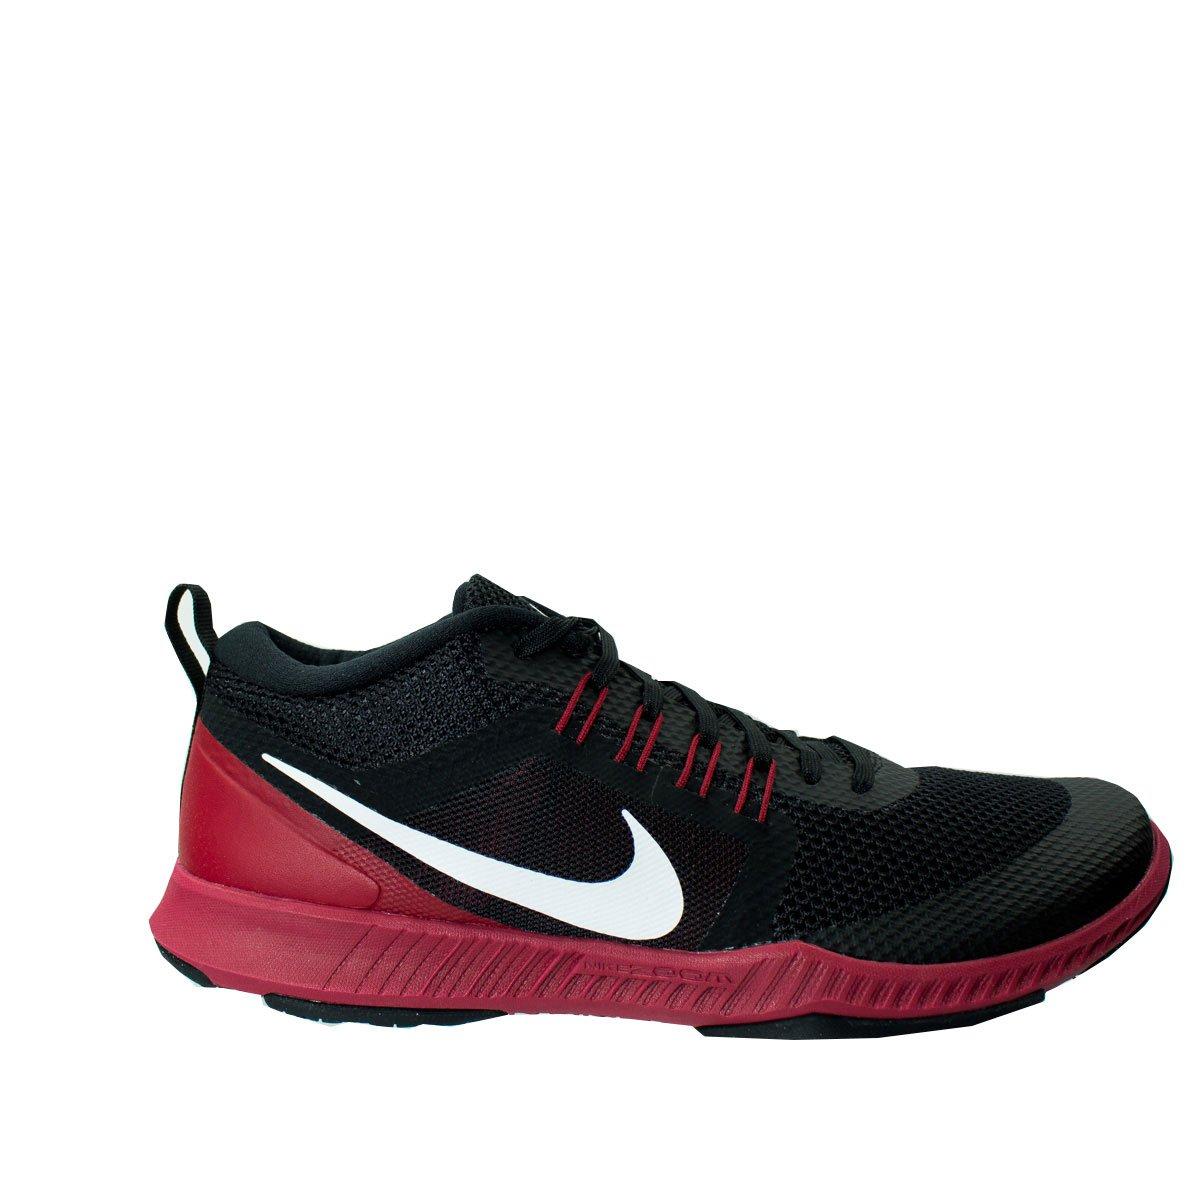 c2dd3eb216 Bizz Store - Tênis Masculino Nike Zoom Domination TR